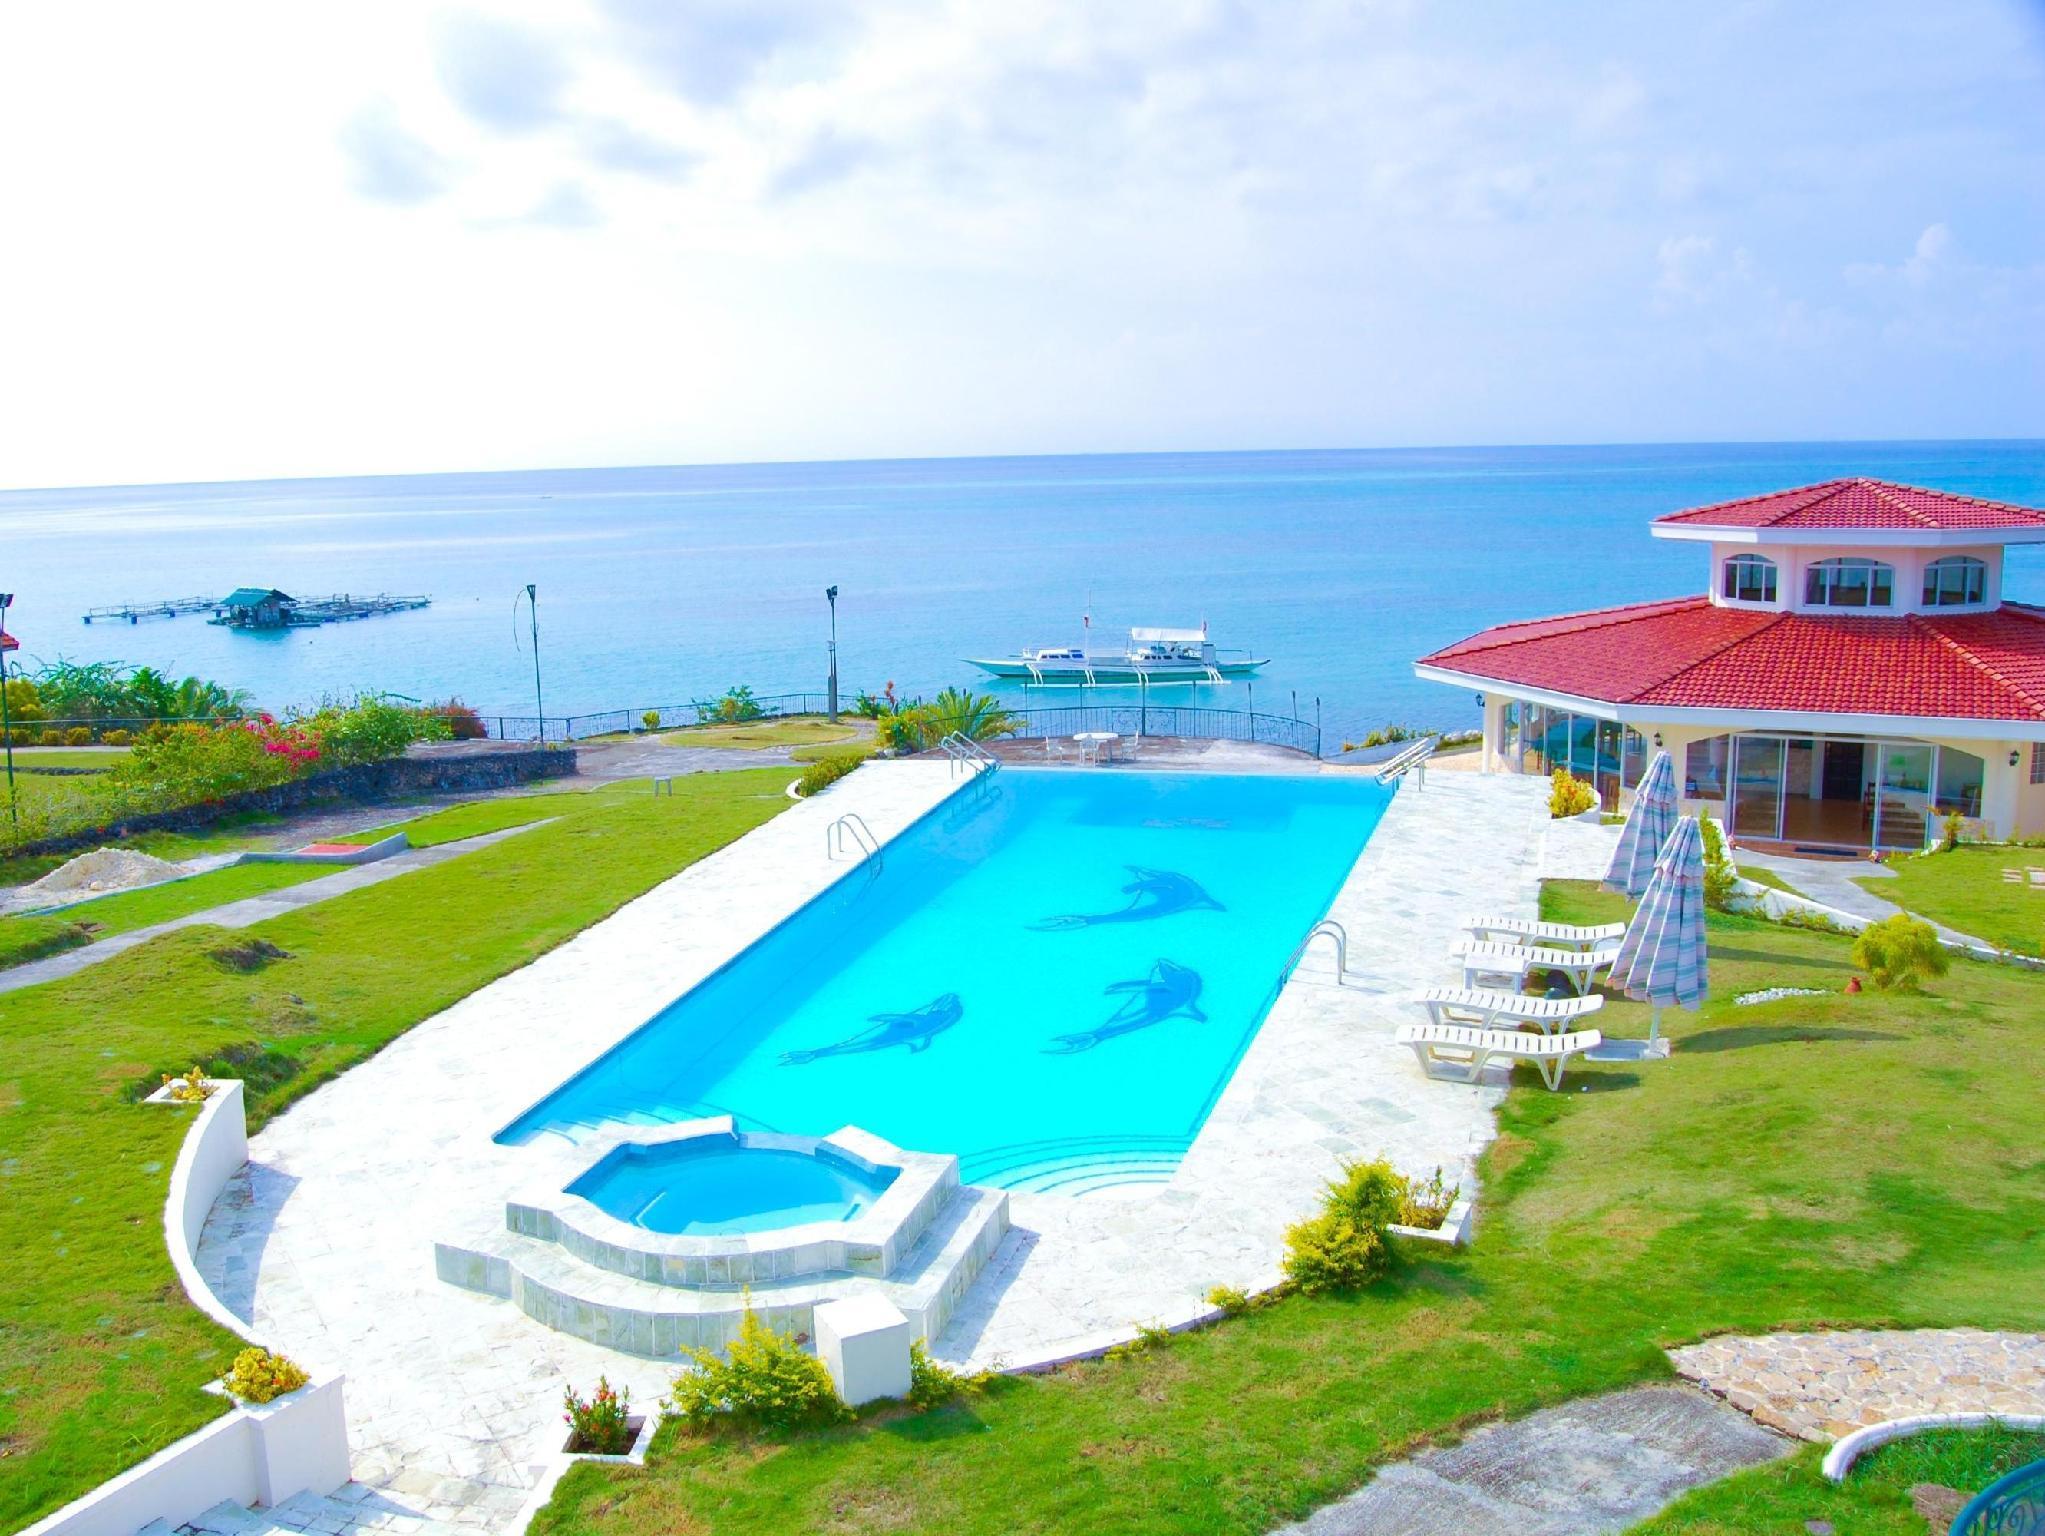 Sherwood Bay Aqua Resort And Dive School